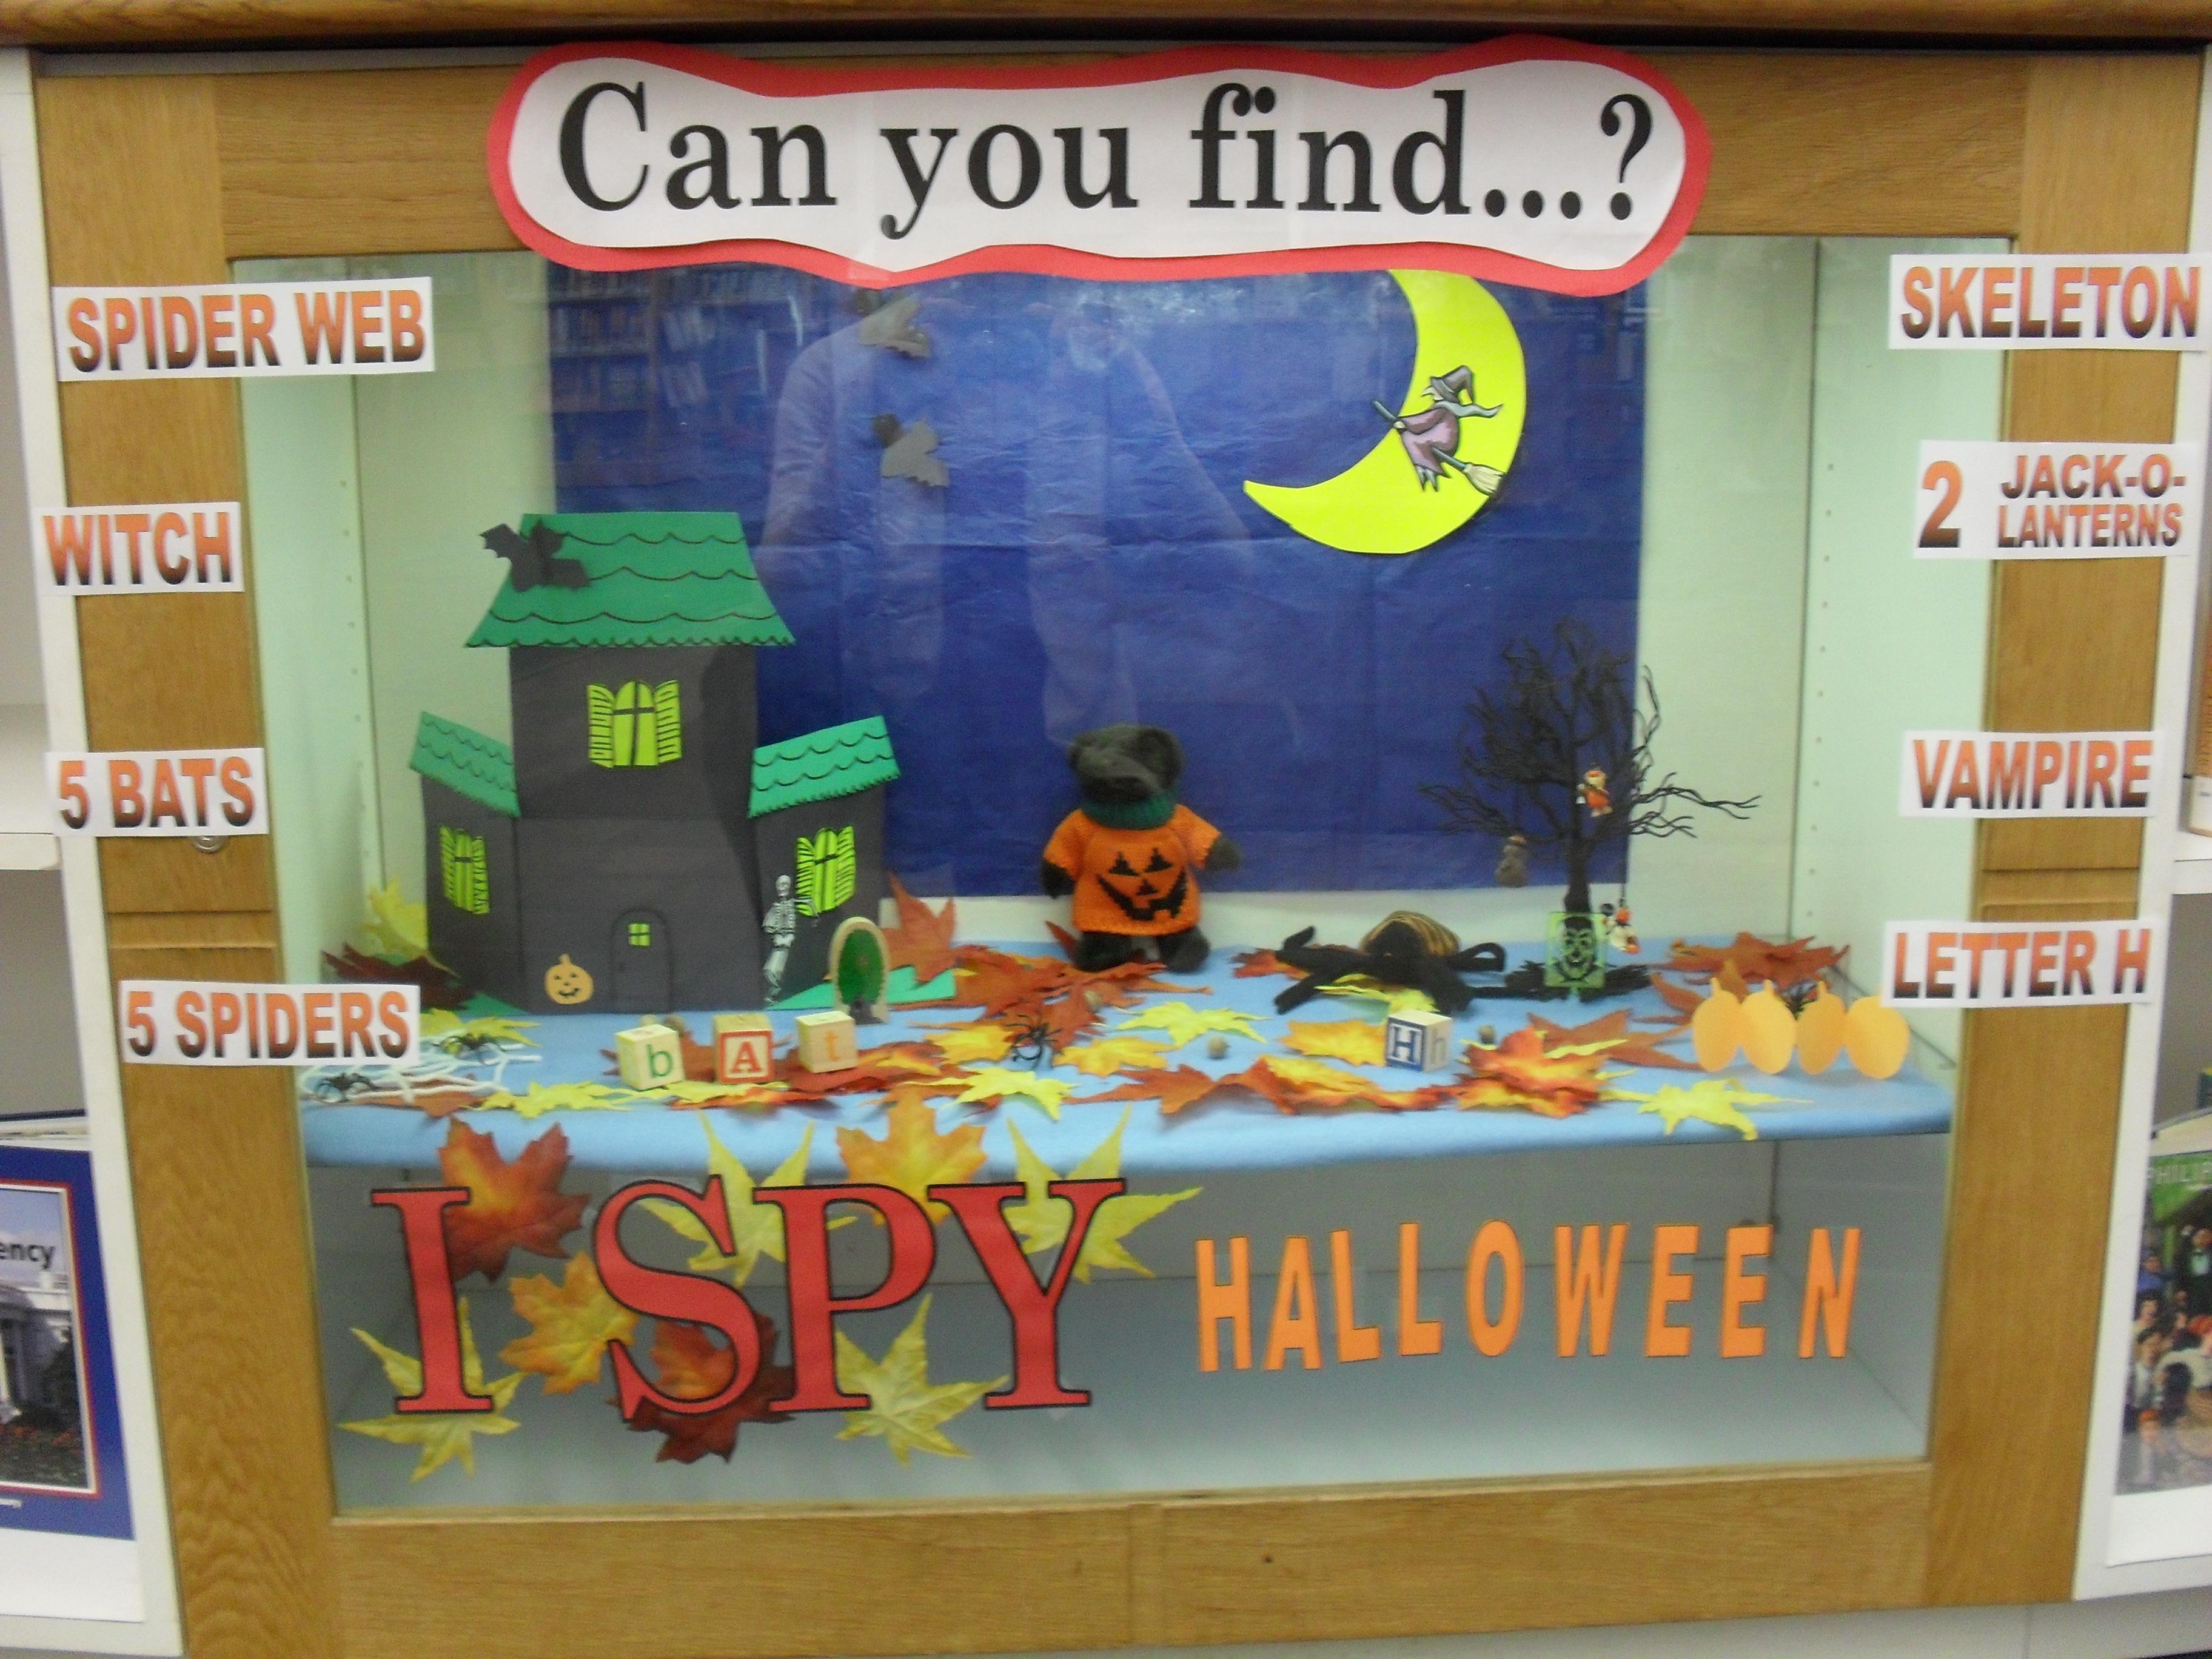 Display Case I Spy Halloween